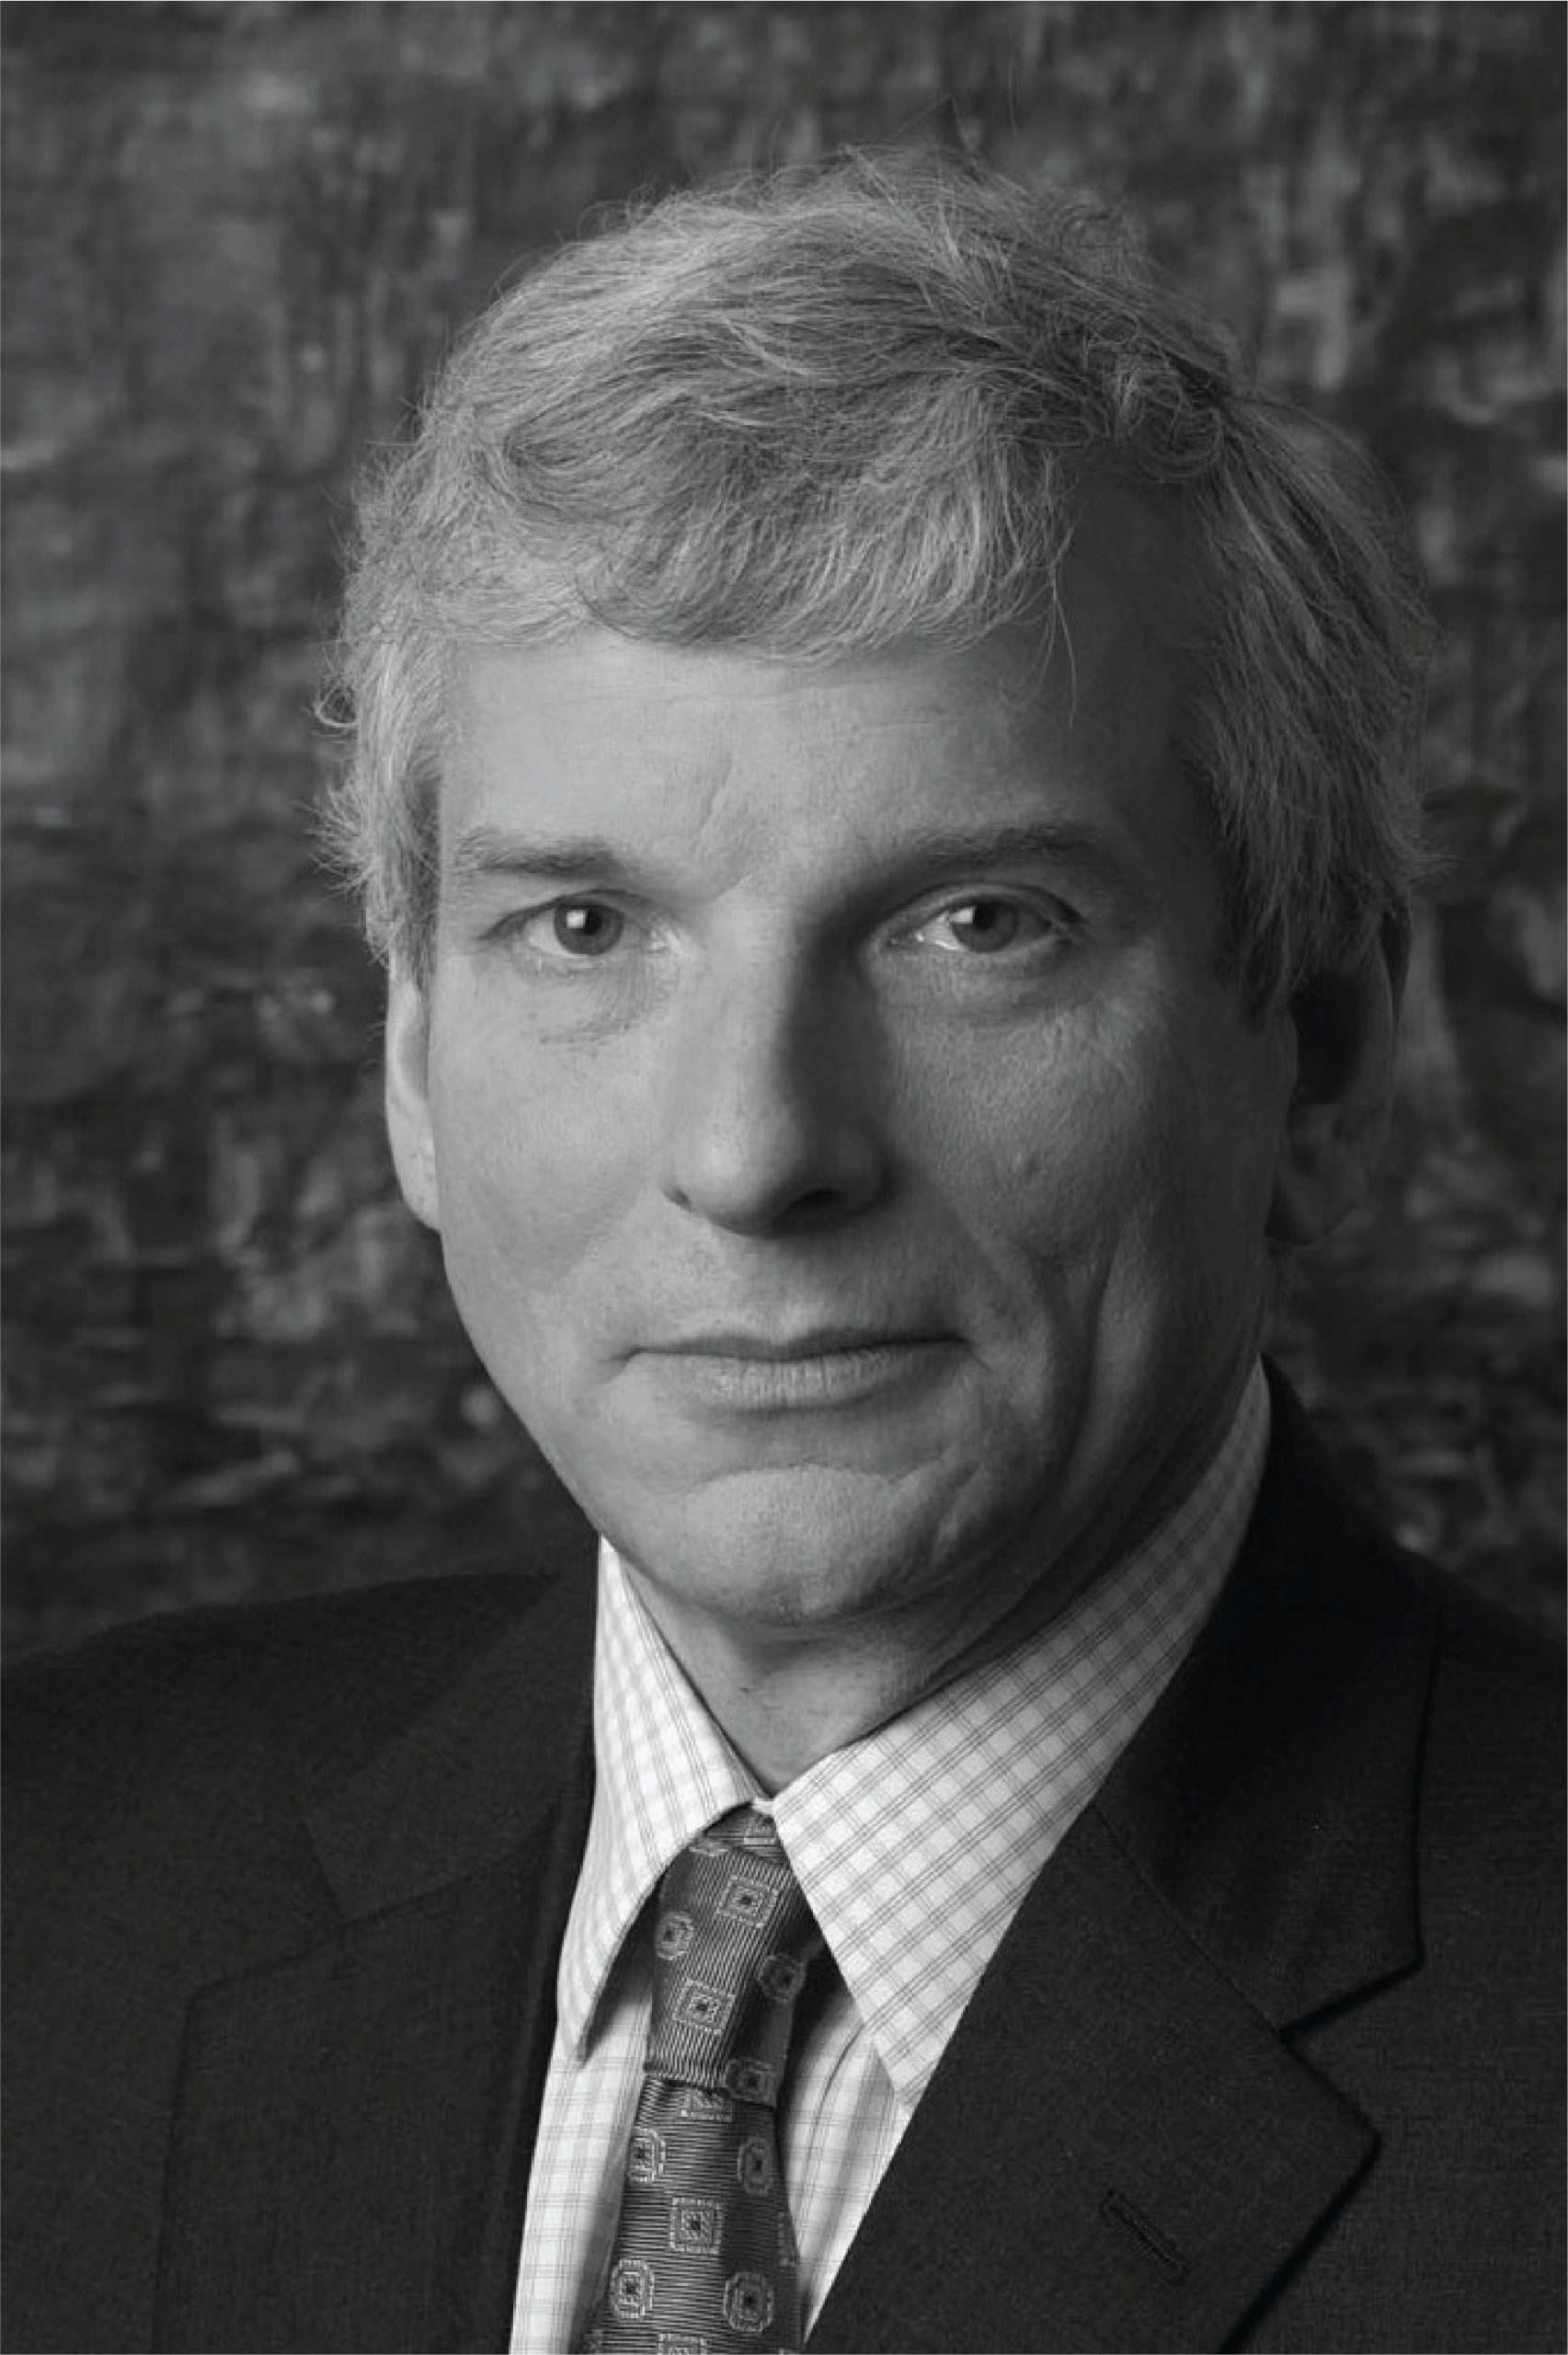 Philip Stoltzfus